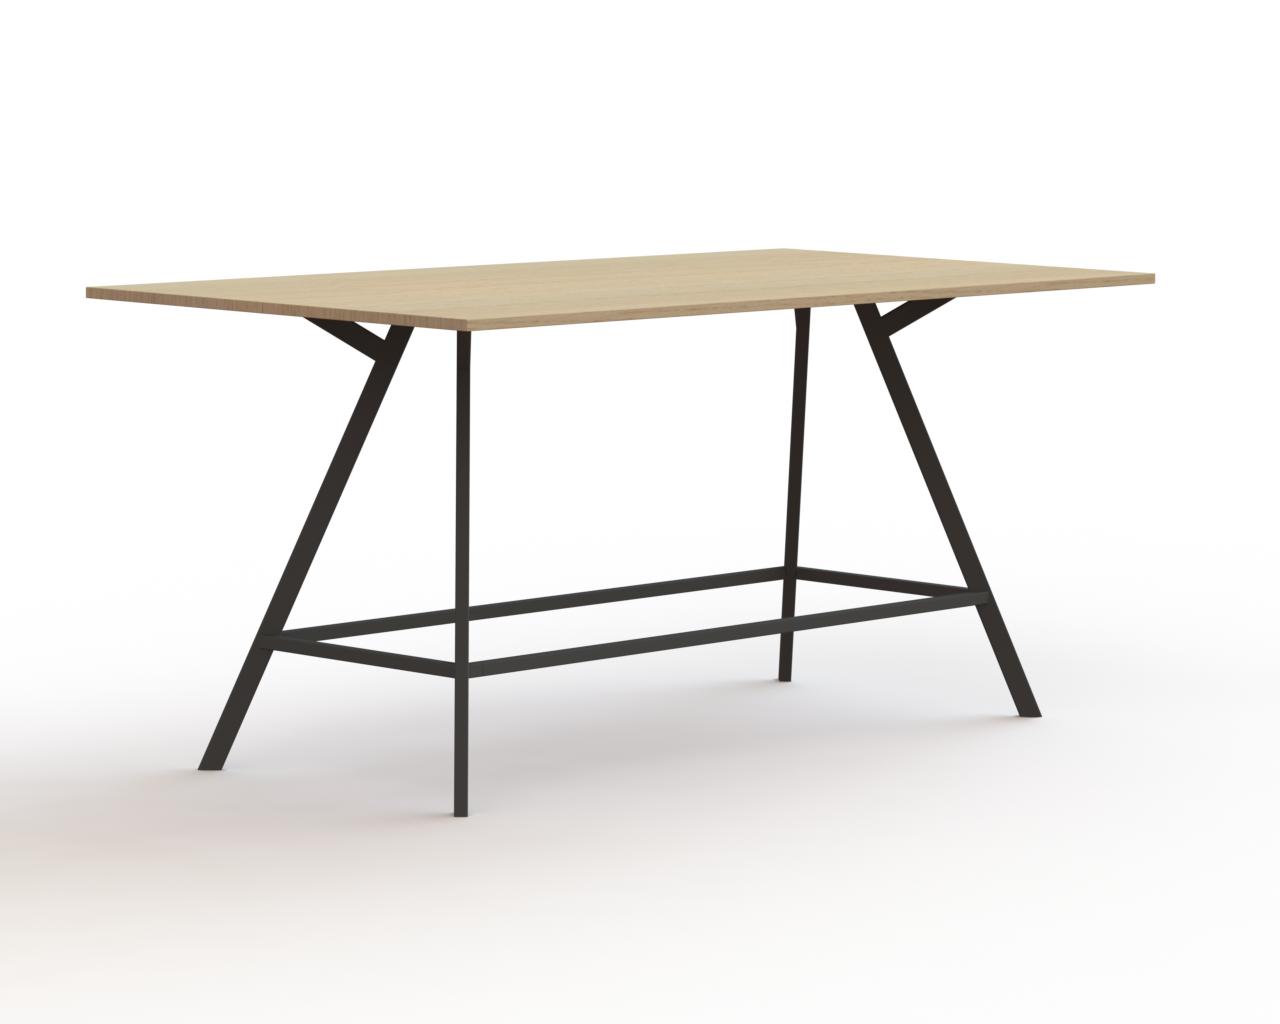 Bridge tafel rechthoek 120×240 poot rechthoek H=110_B_190123